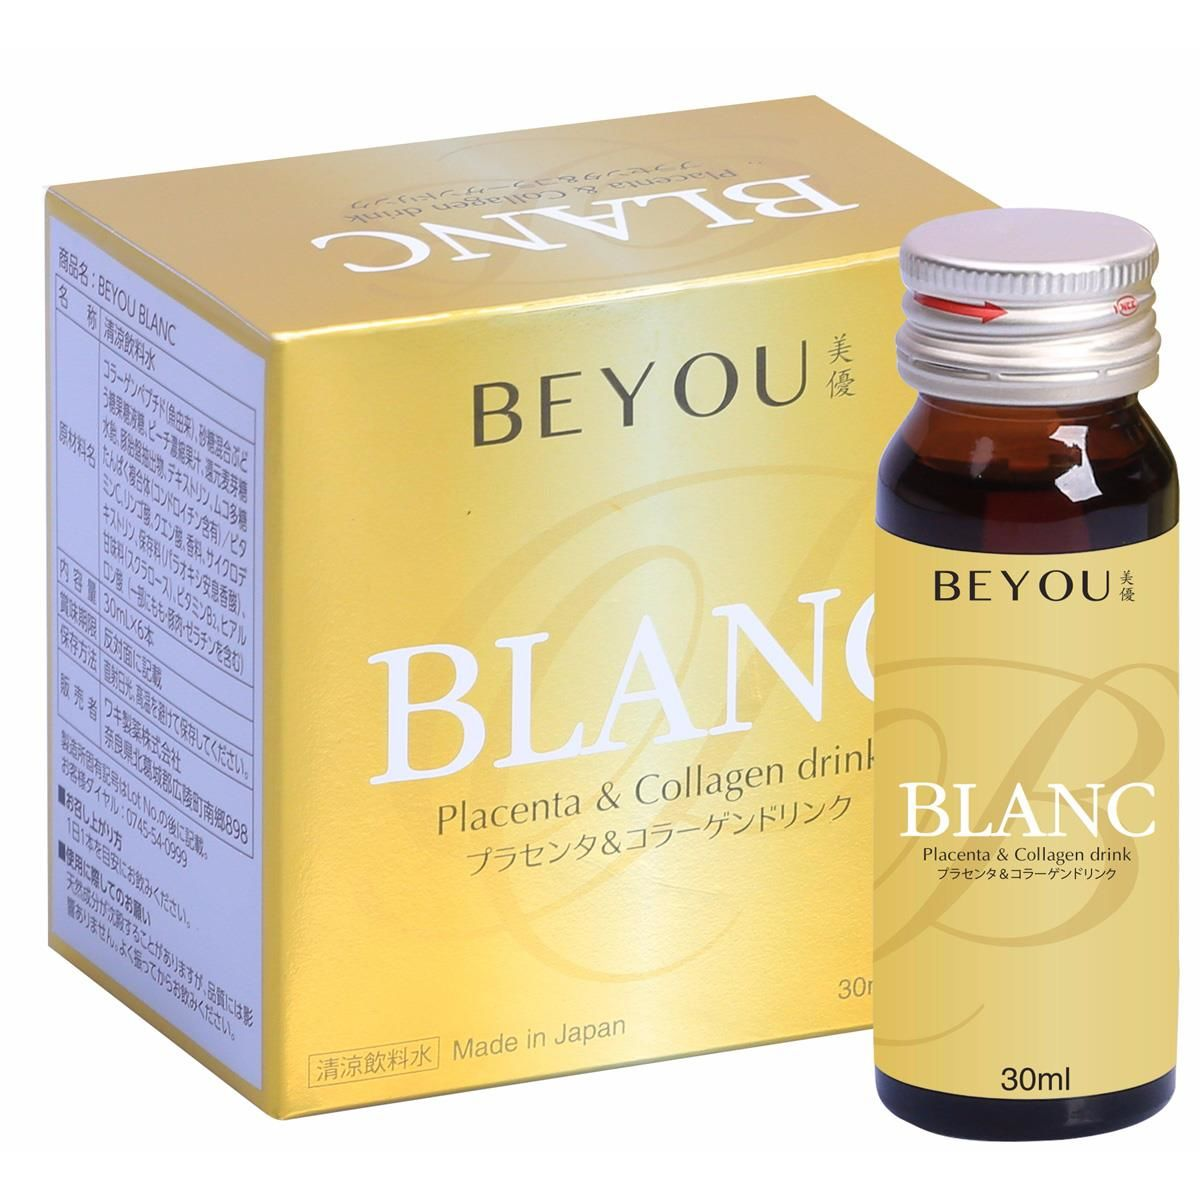 Collagen nhau thai heo Beyou Blanc giúp trị nám, trắng da